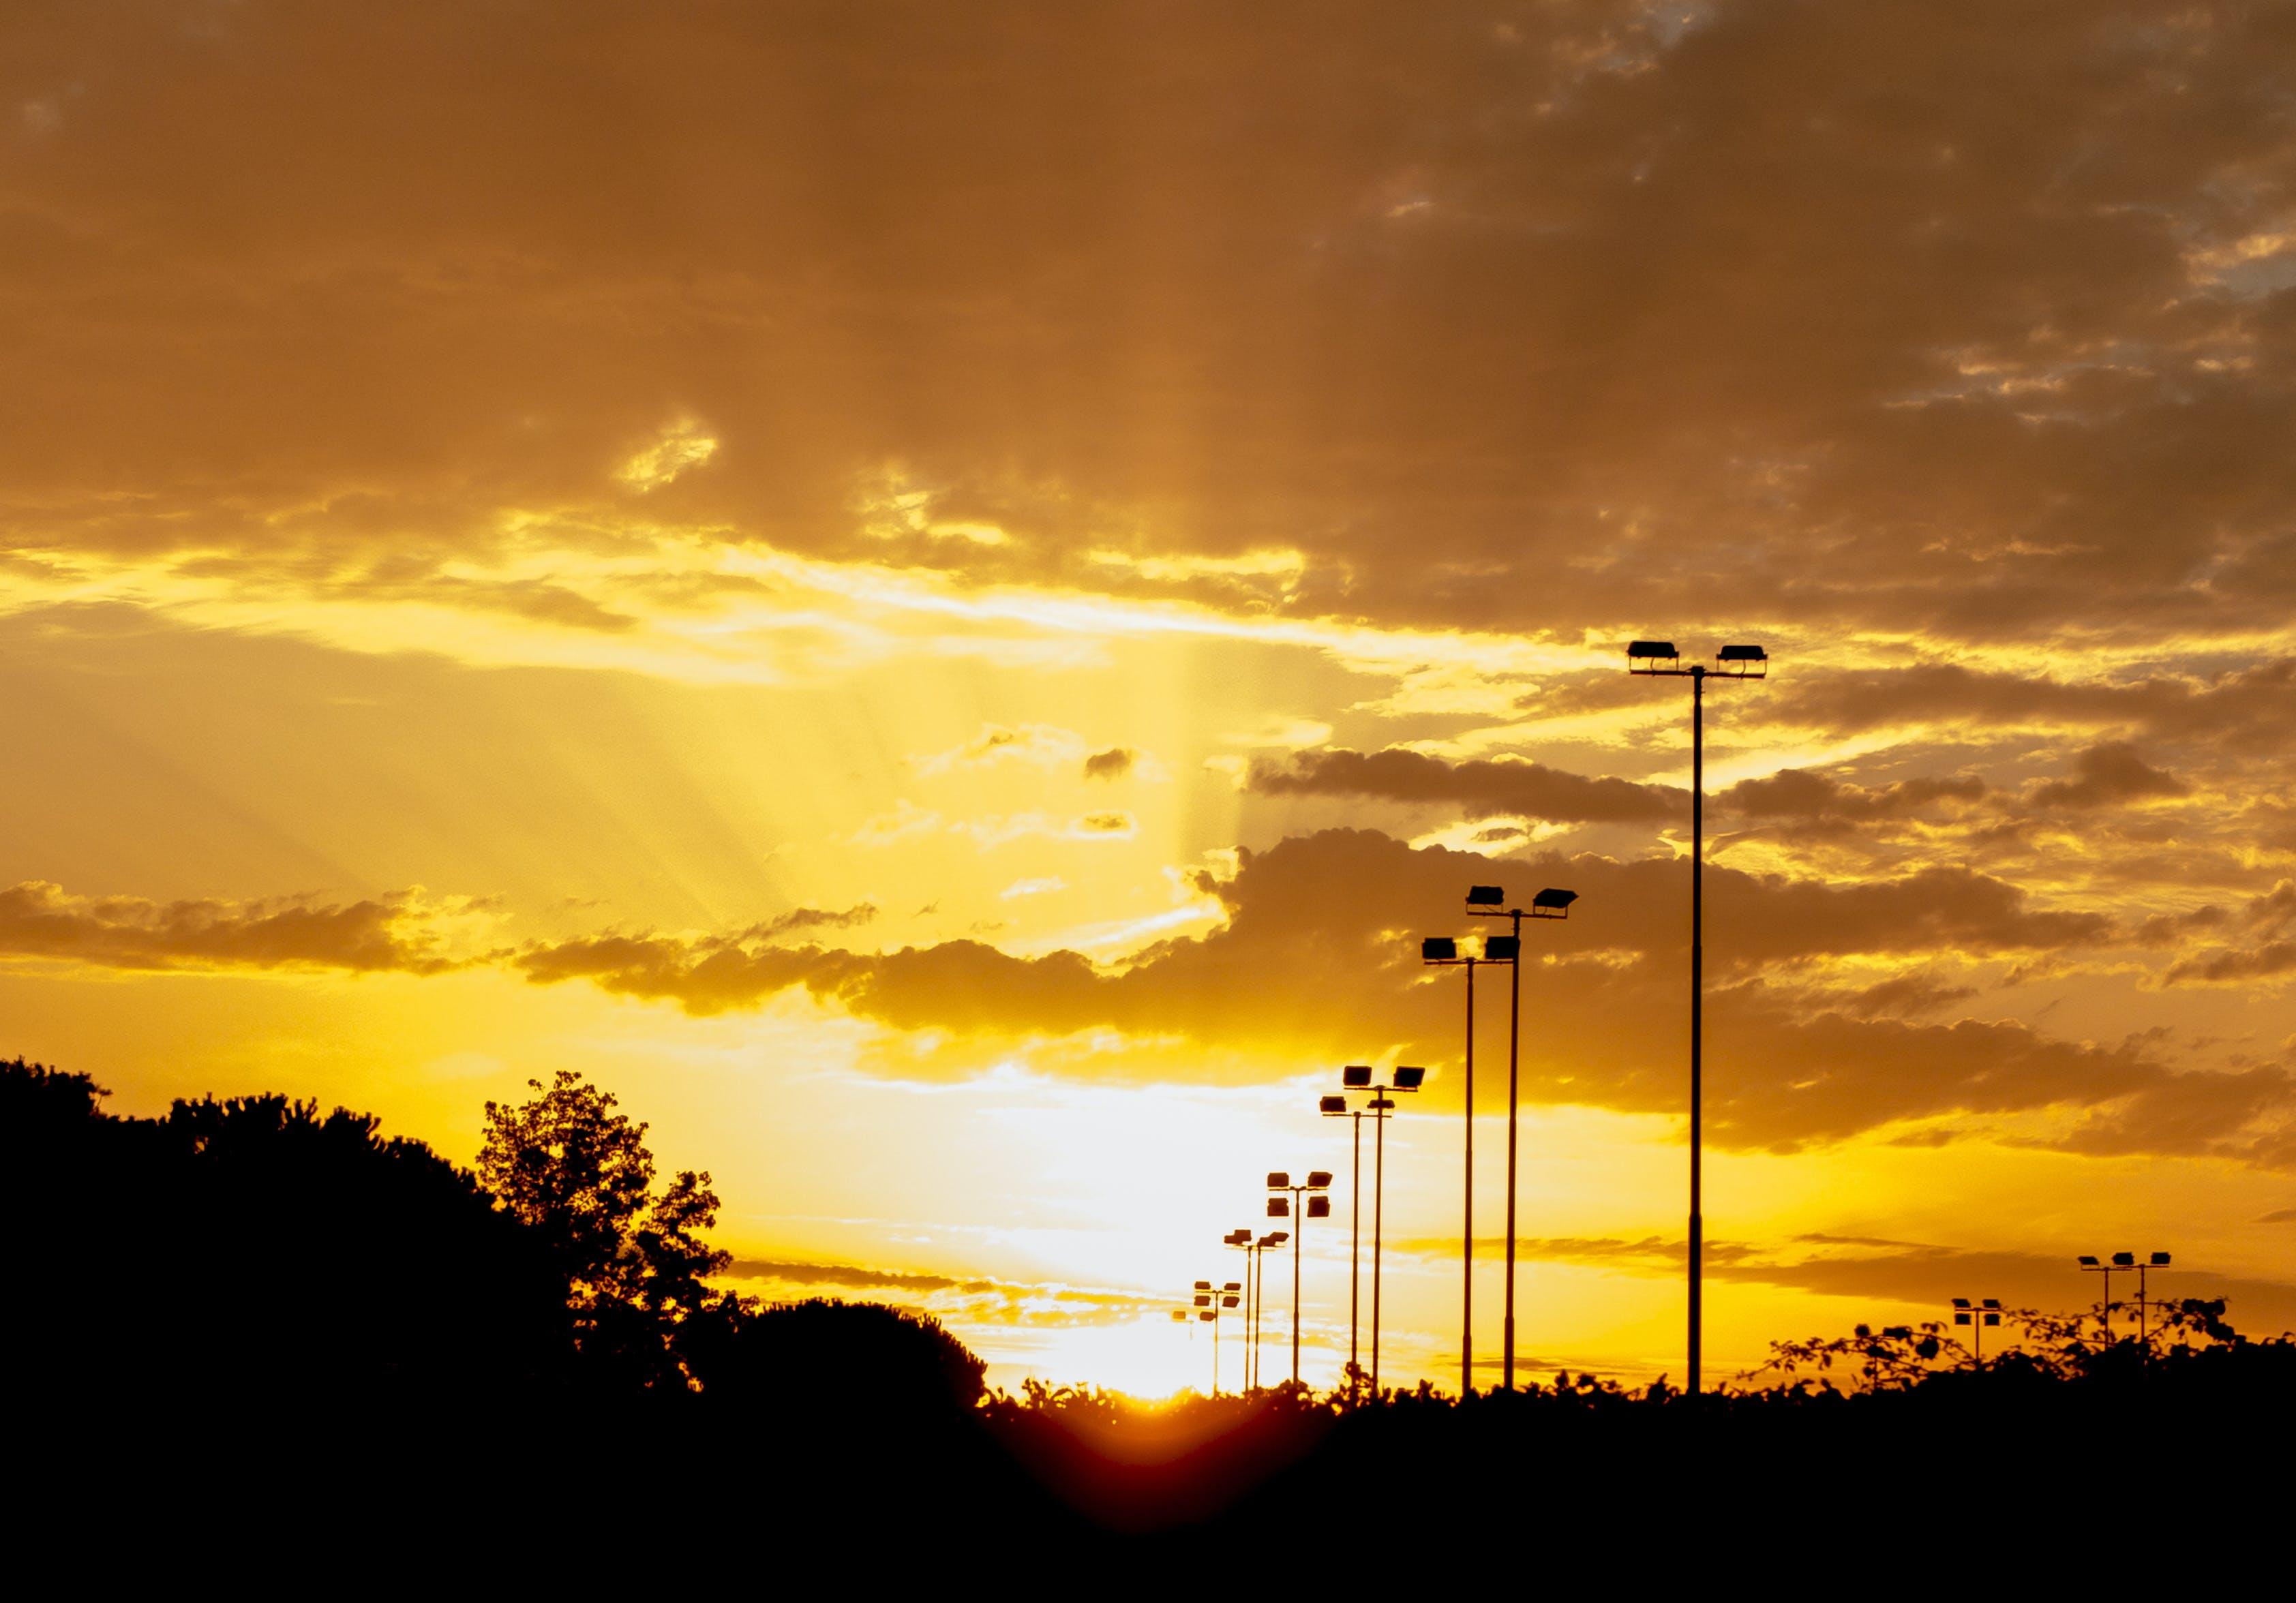 Street Lights during Sunset